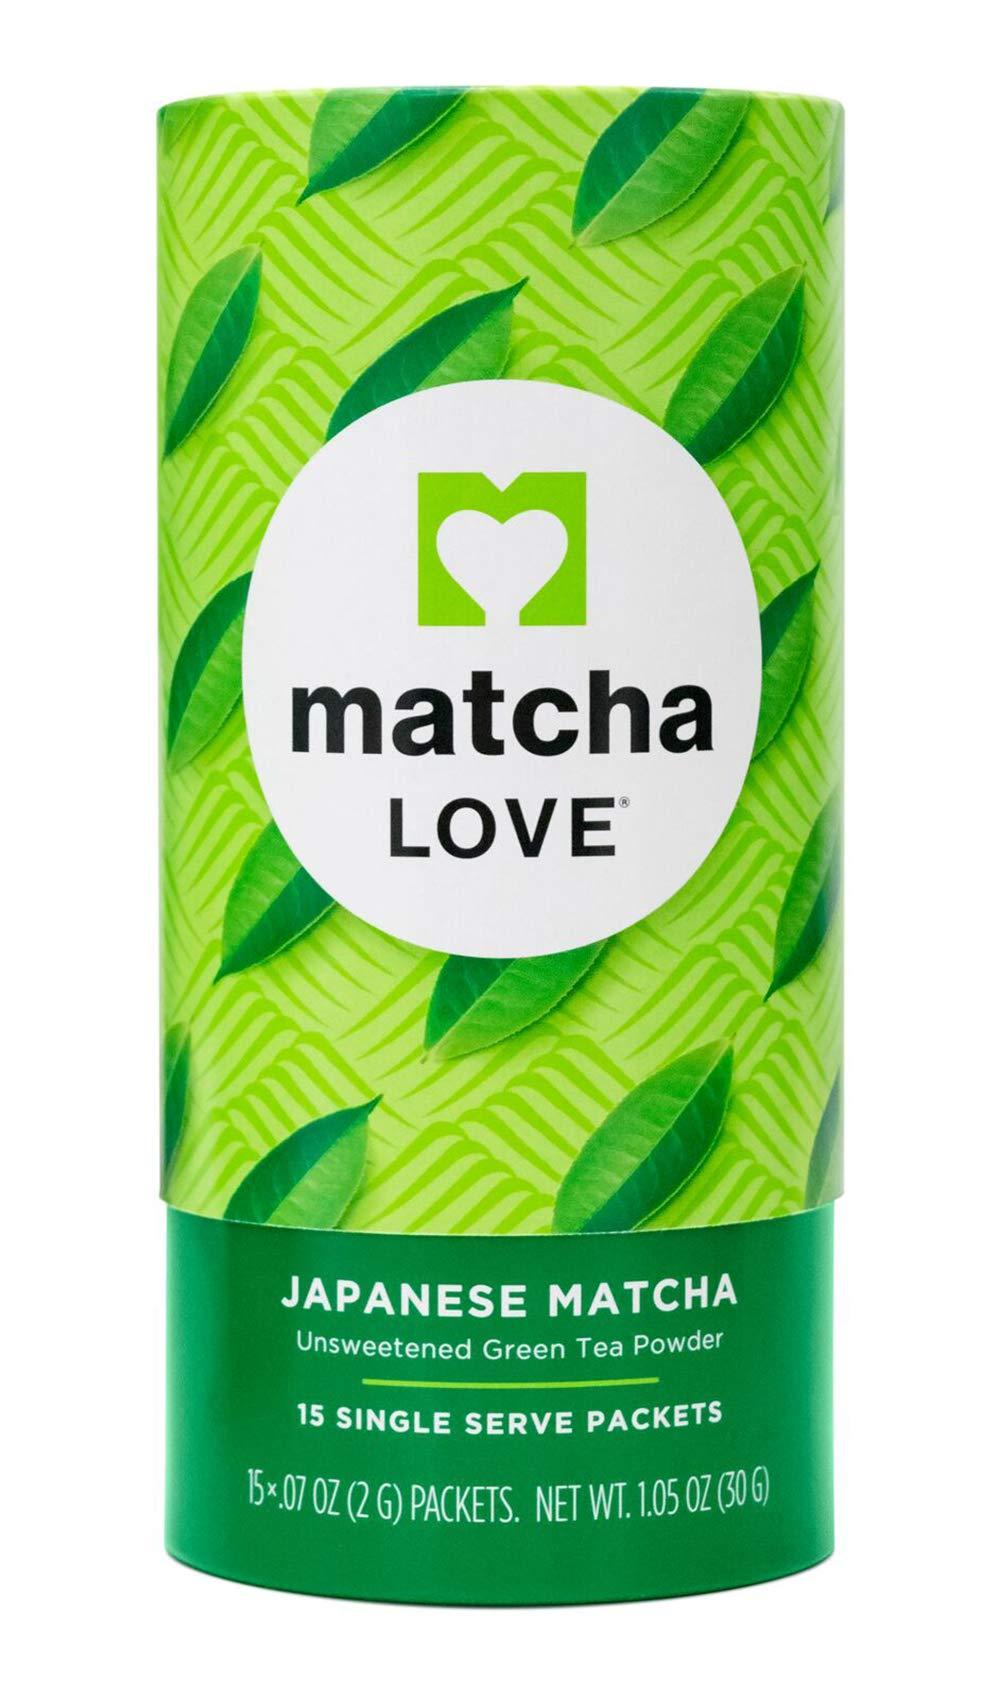 Matcha Love Japanese Matcha, Unsweetened Green Tea Powder Packets, 15 Single Serve Packets, 1.05 Ounce Can